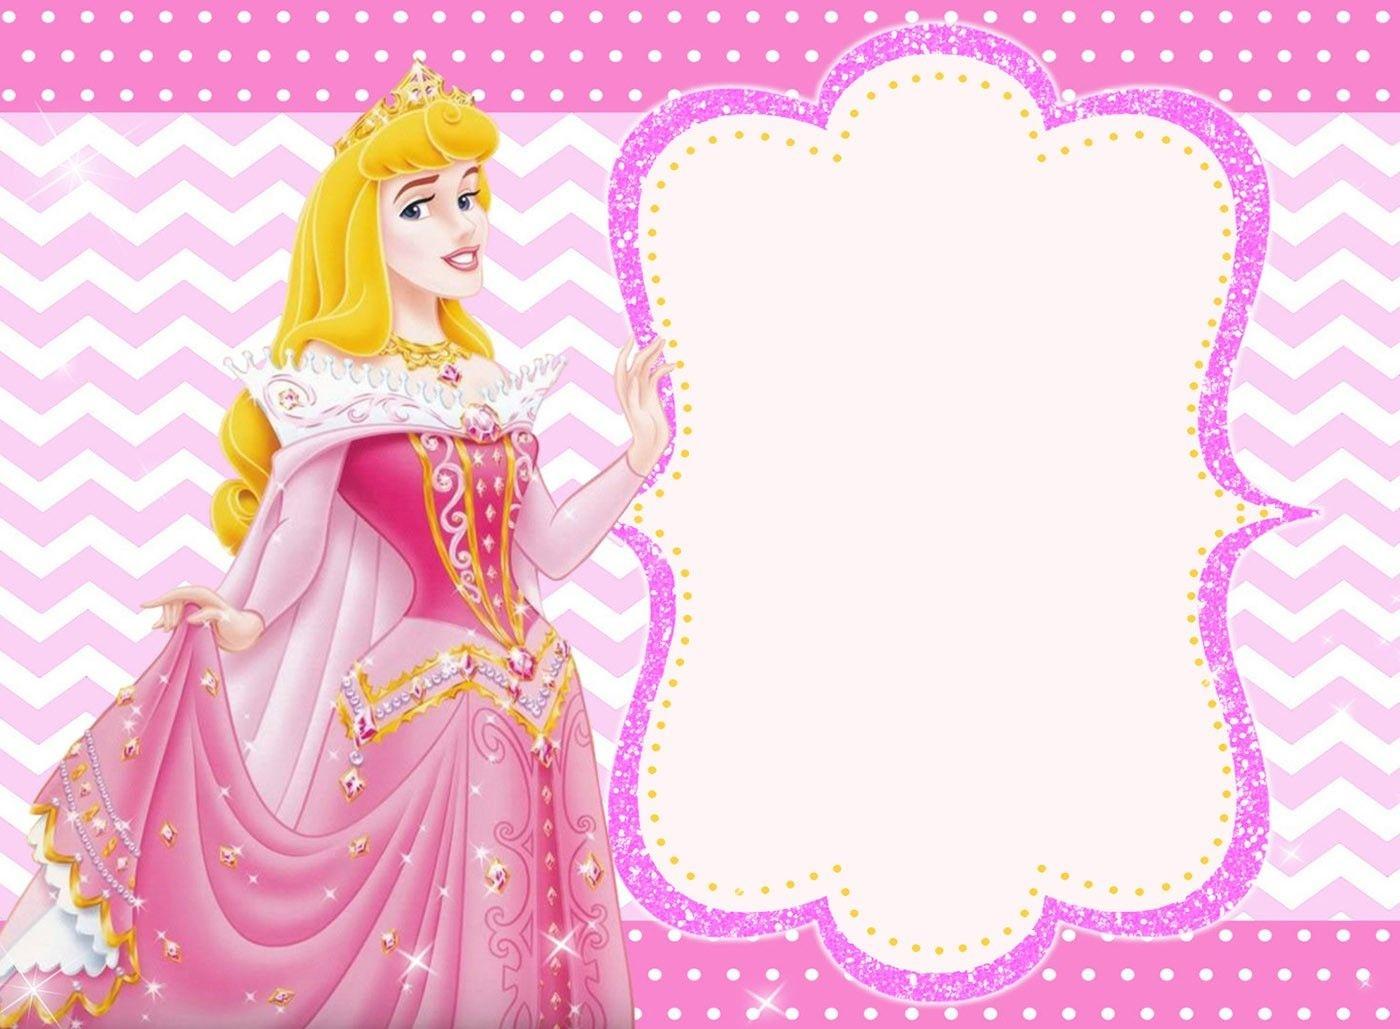 Free Printable Princess Invitation Templates | Invitations - Free Printable Princess Invitation Cards